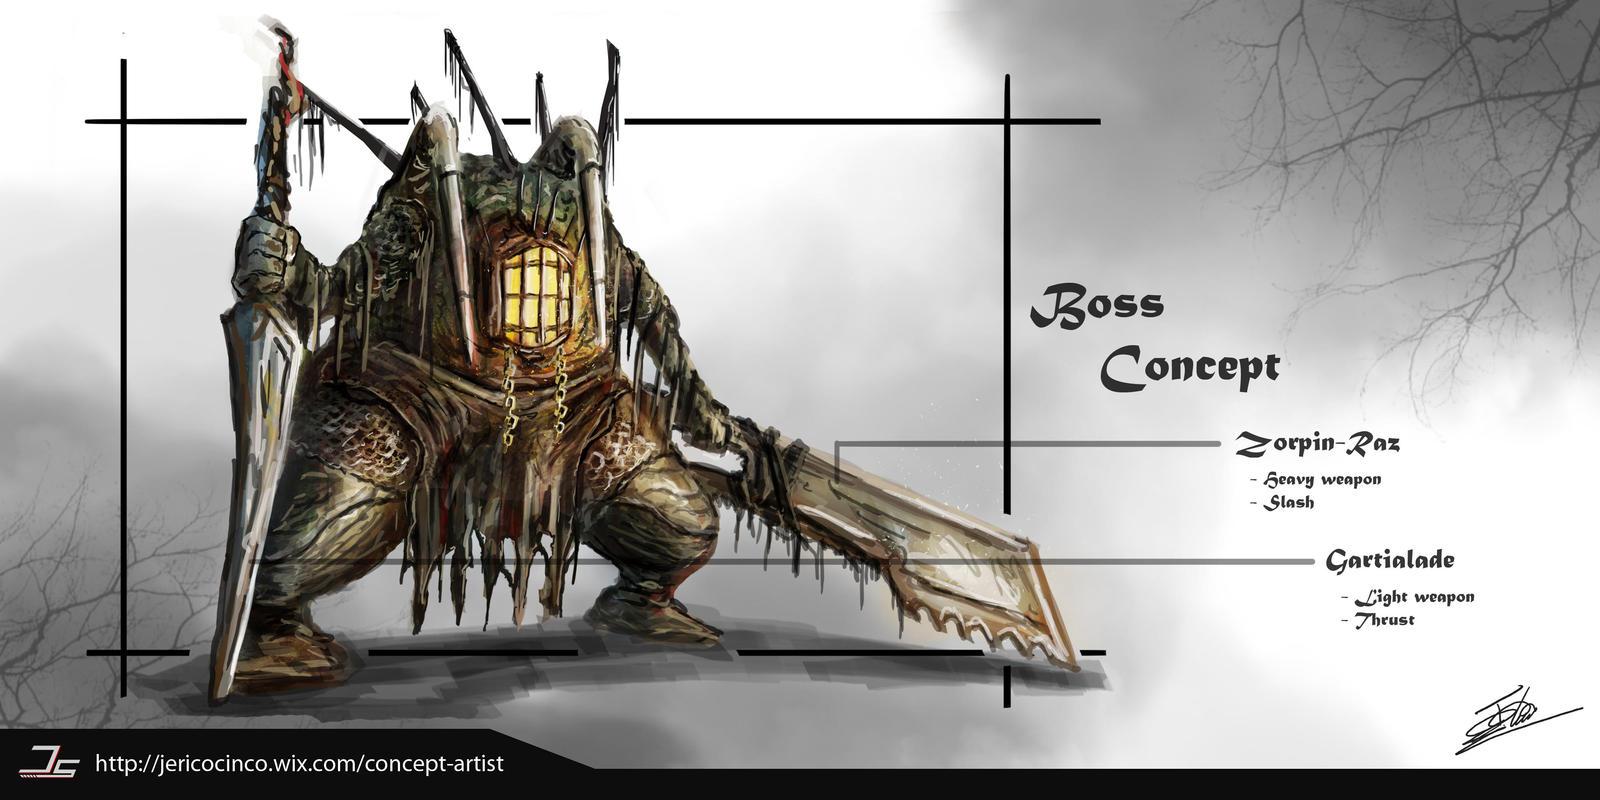 Dark soul 3 x bioshock boss design by jcinc1 on deviantart for Dark souls 3 architecture